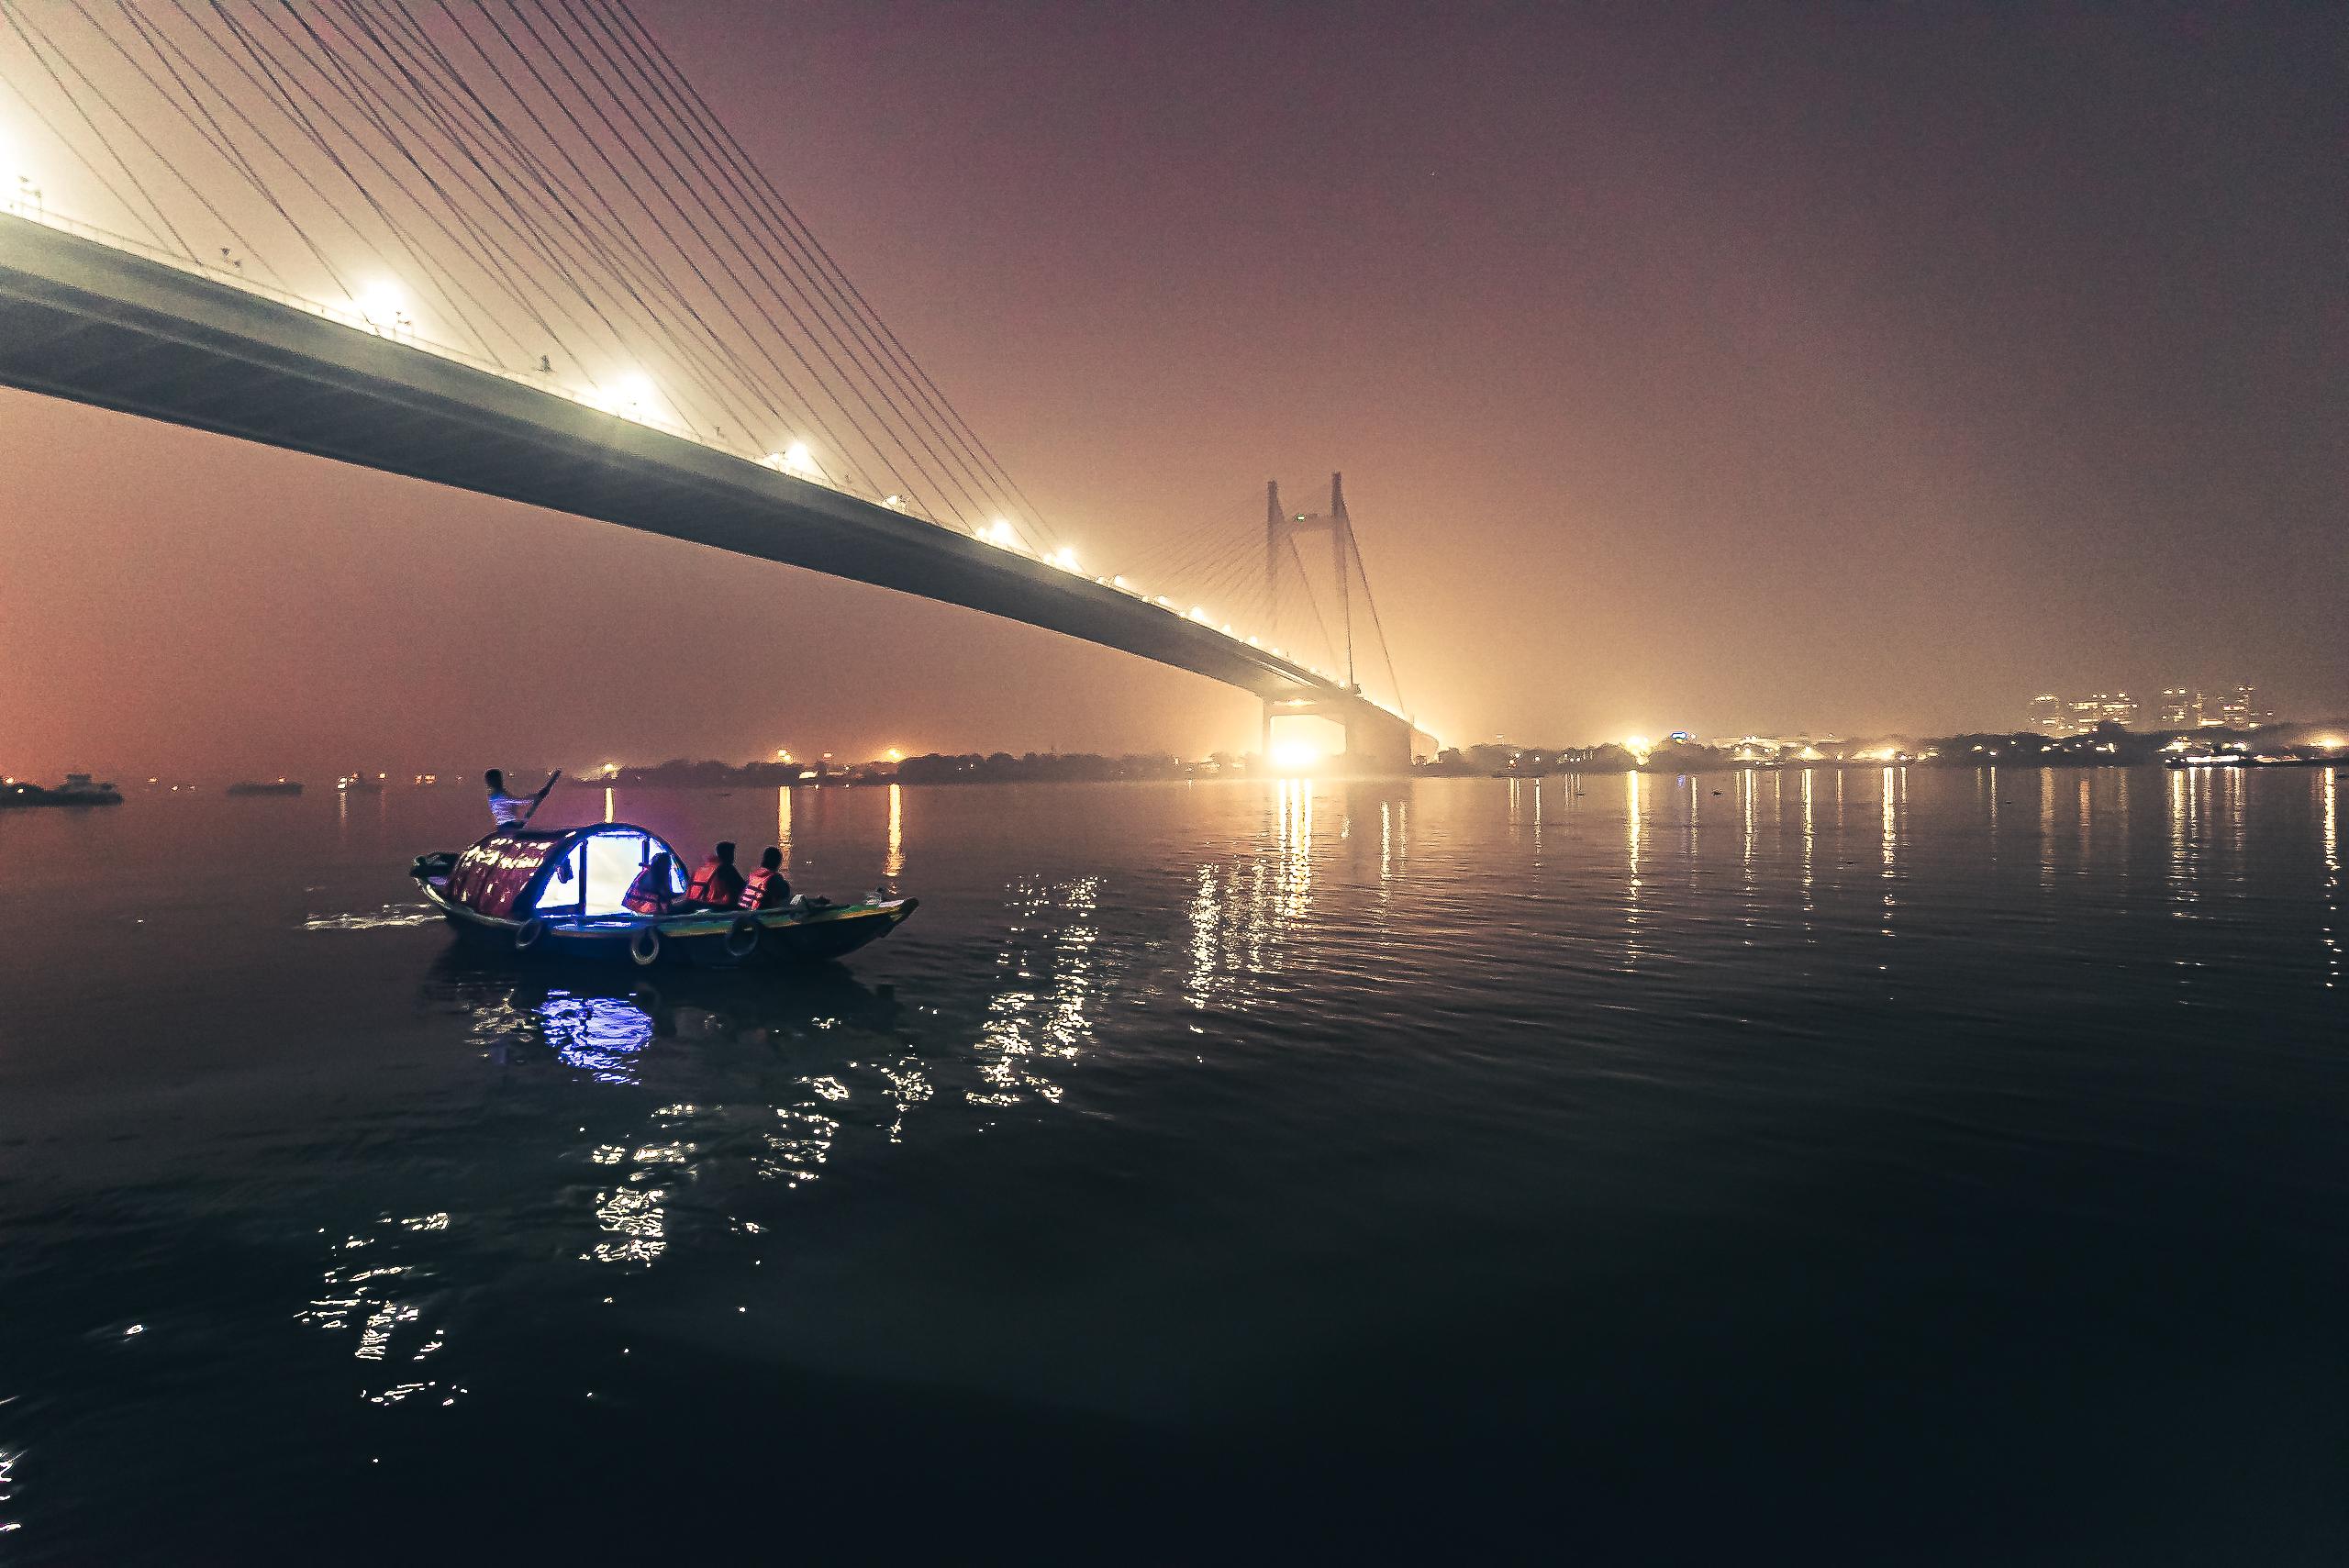 Howrah bridge at night time